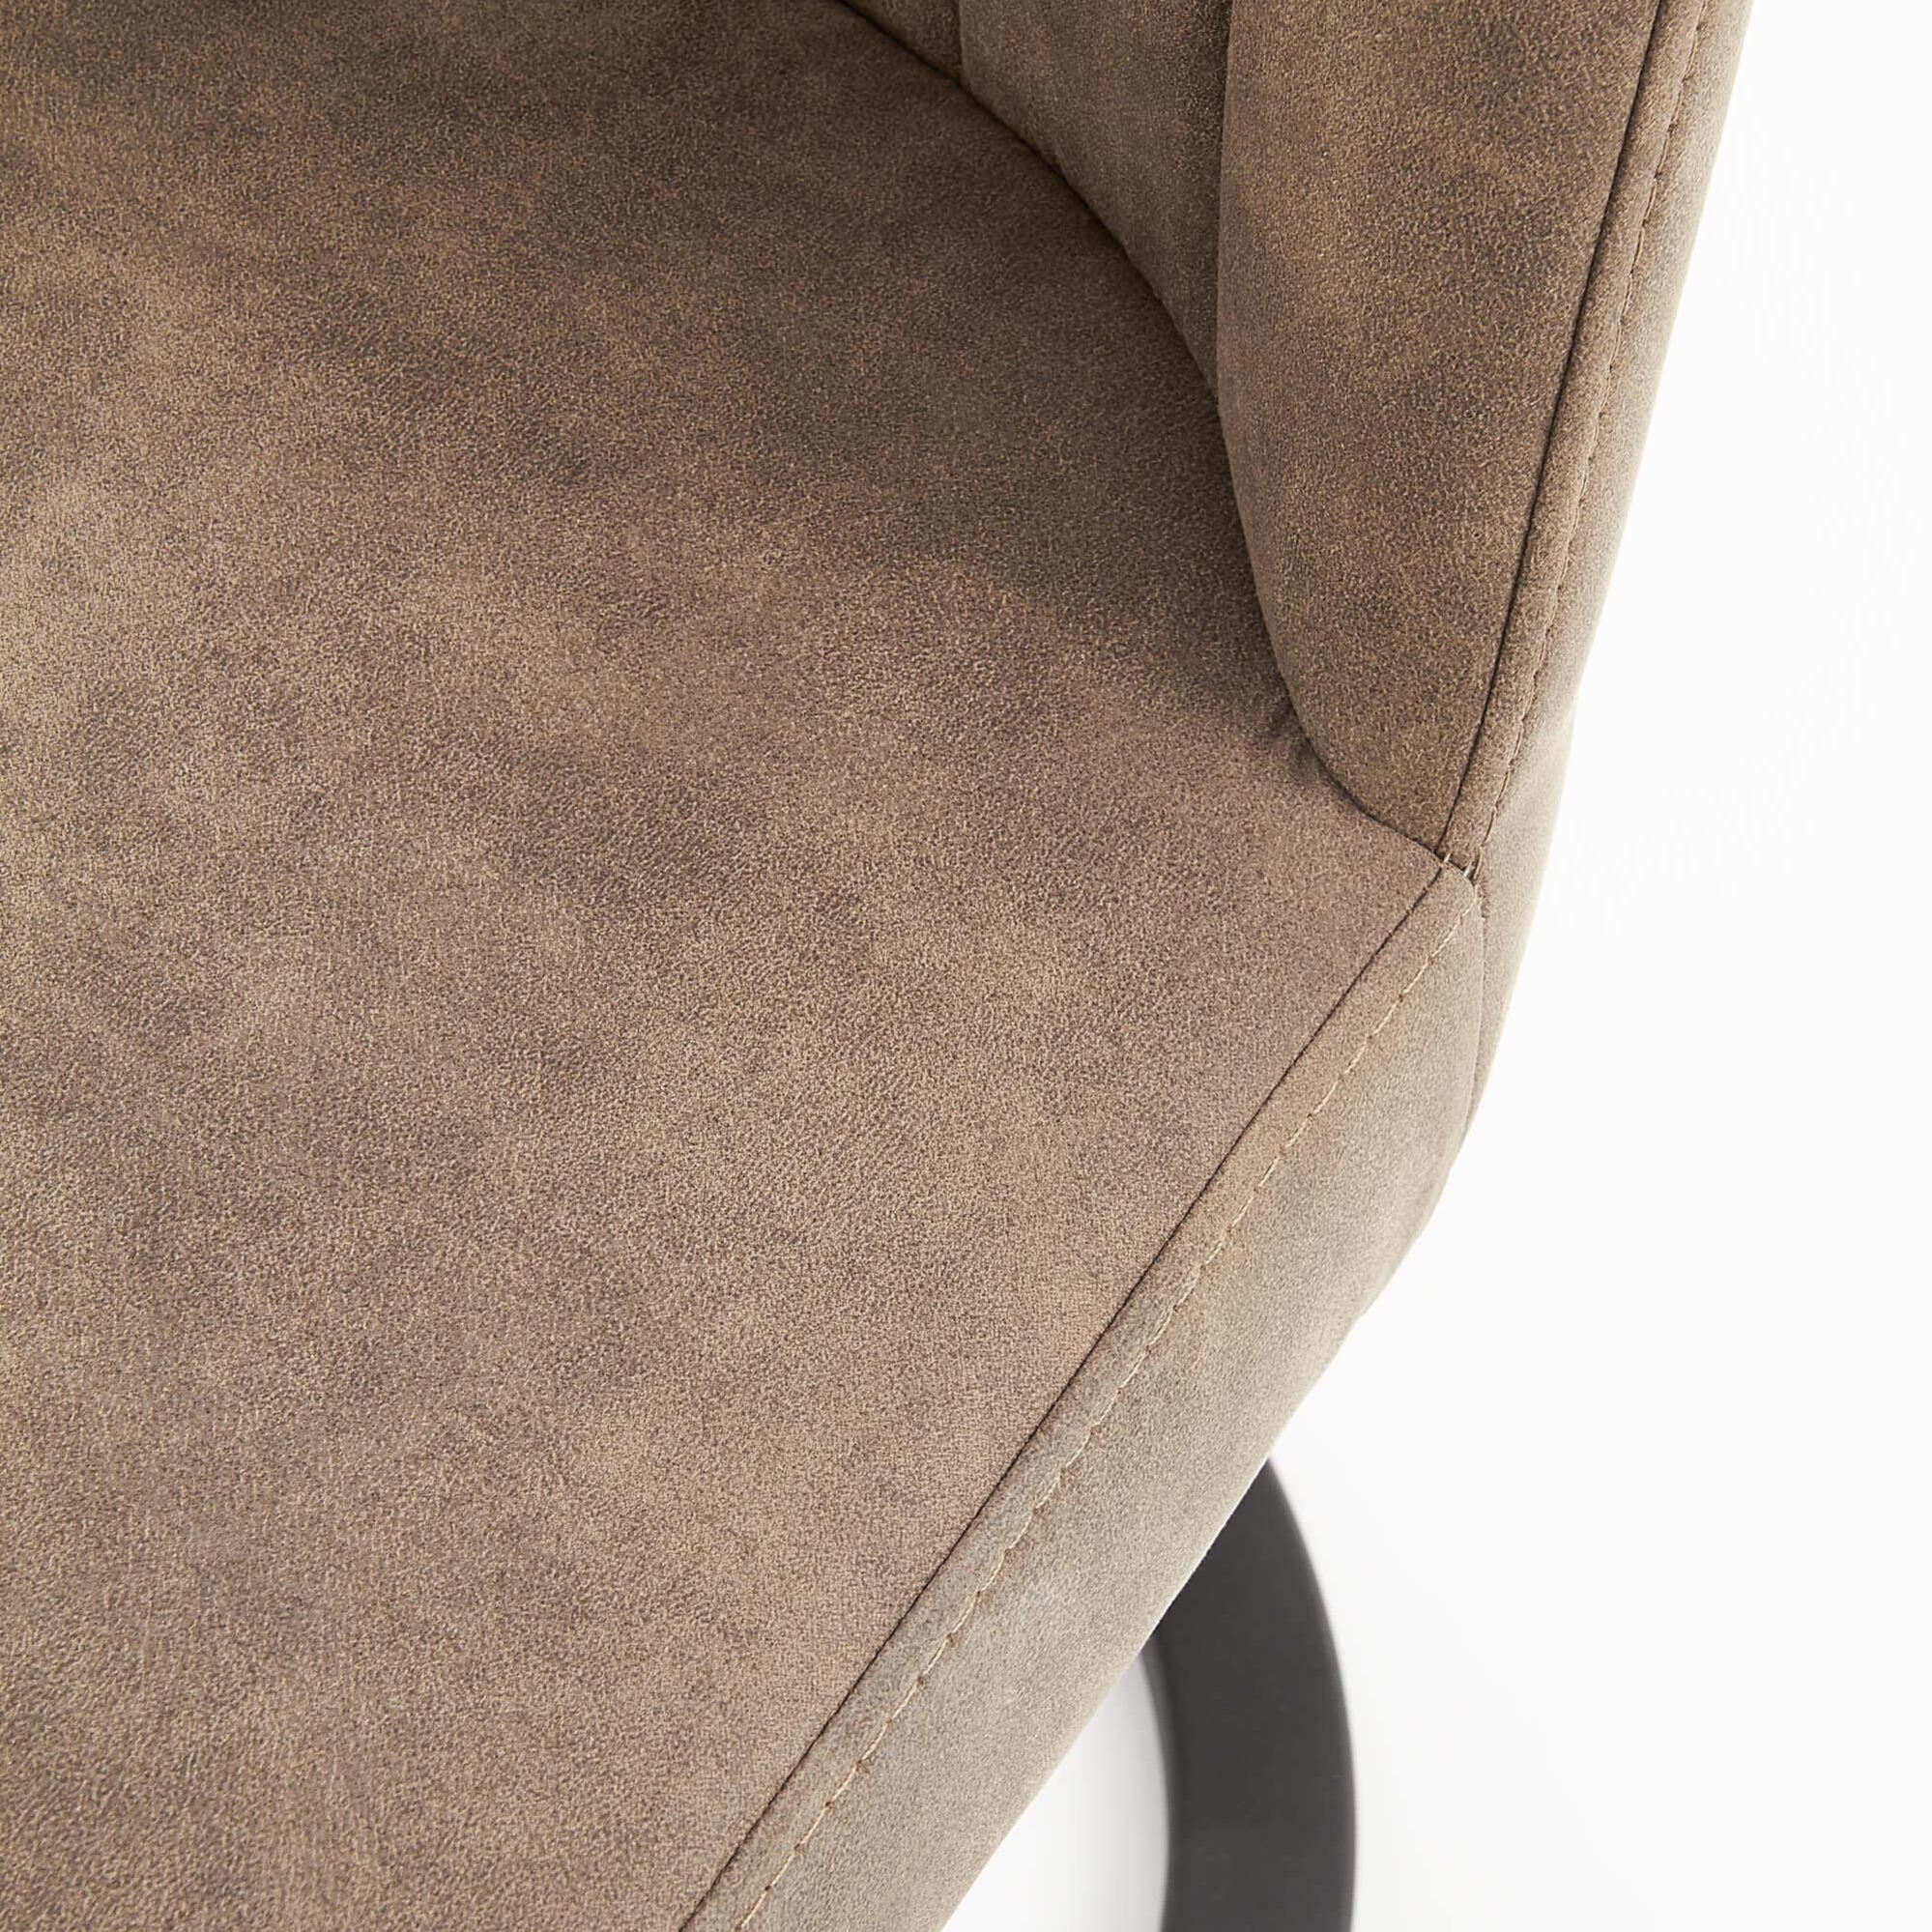 Scaun tapitat piele ecologica K338 - maro